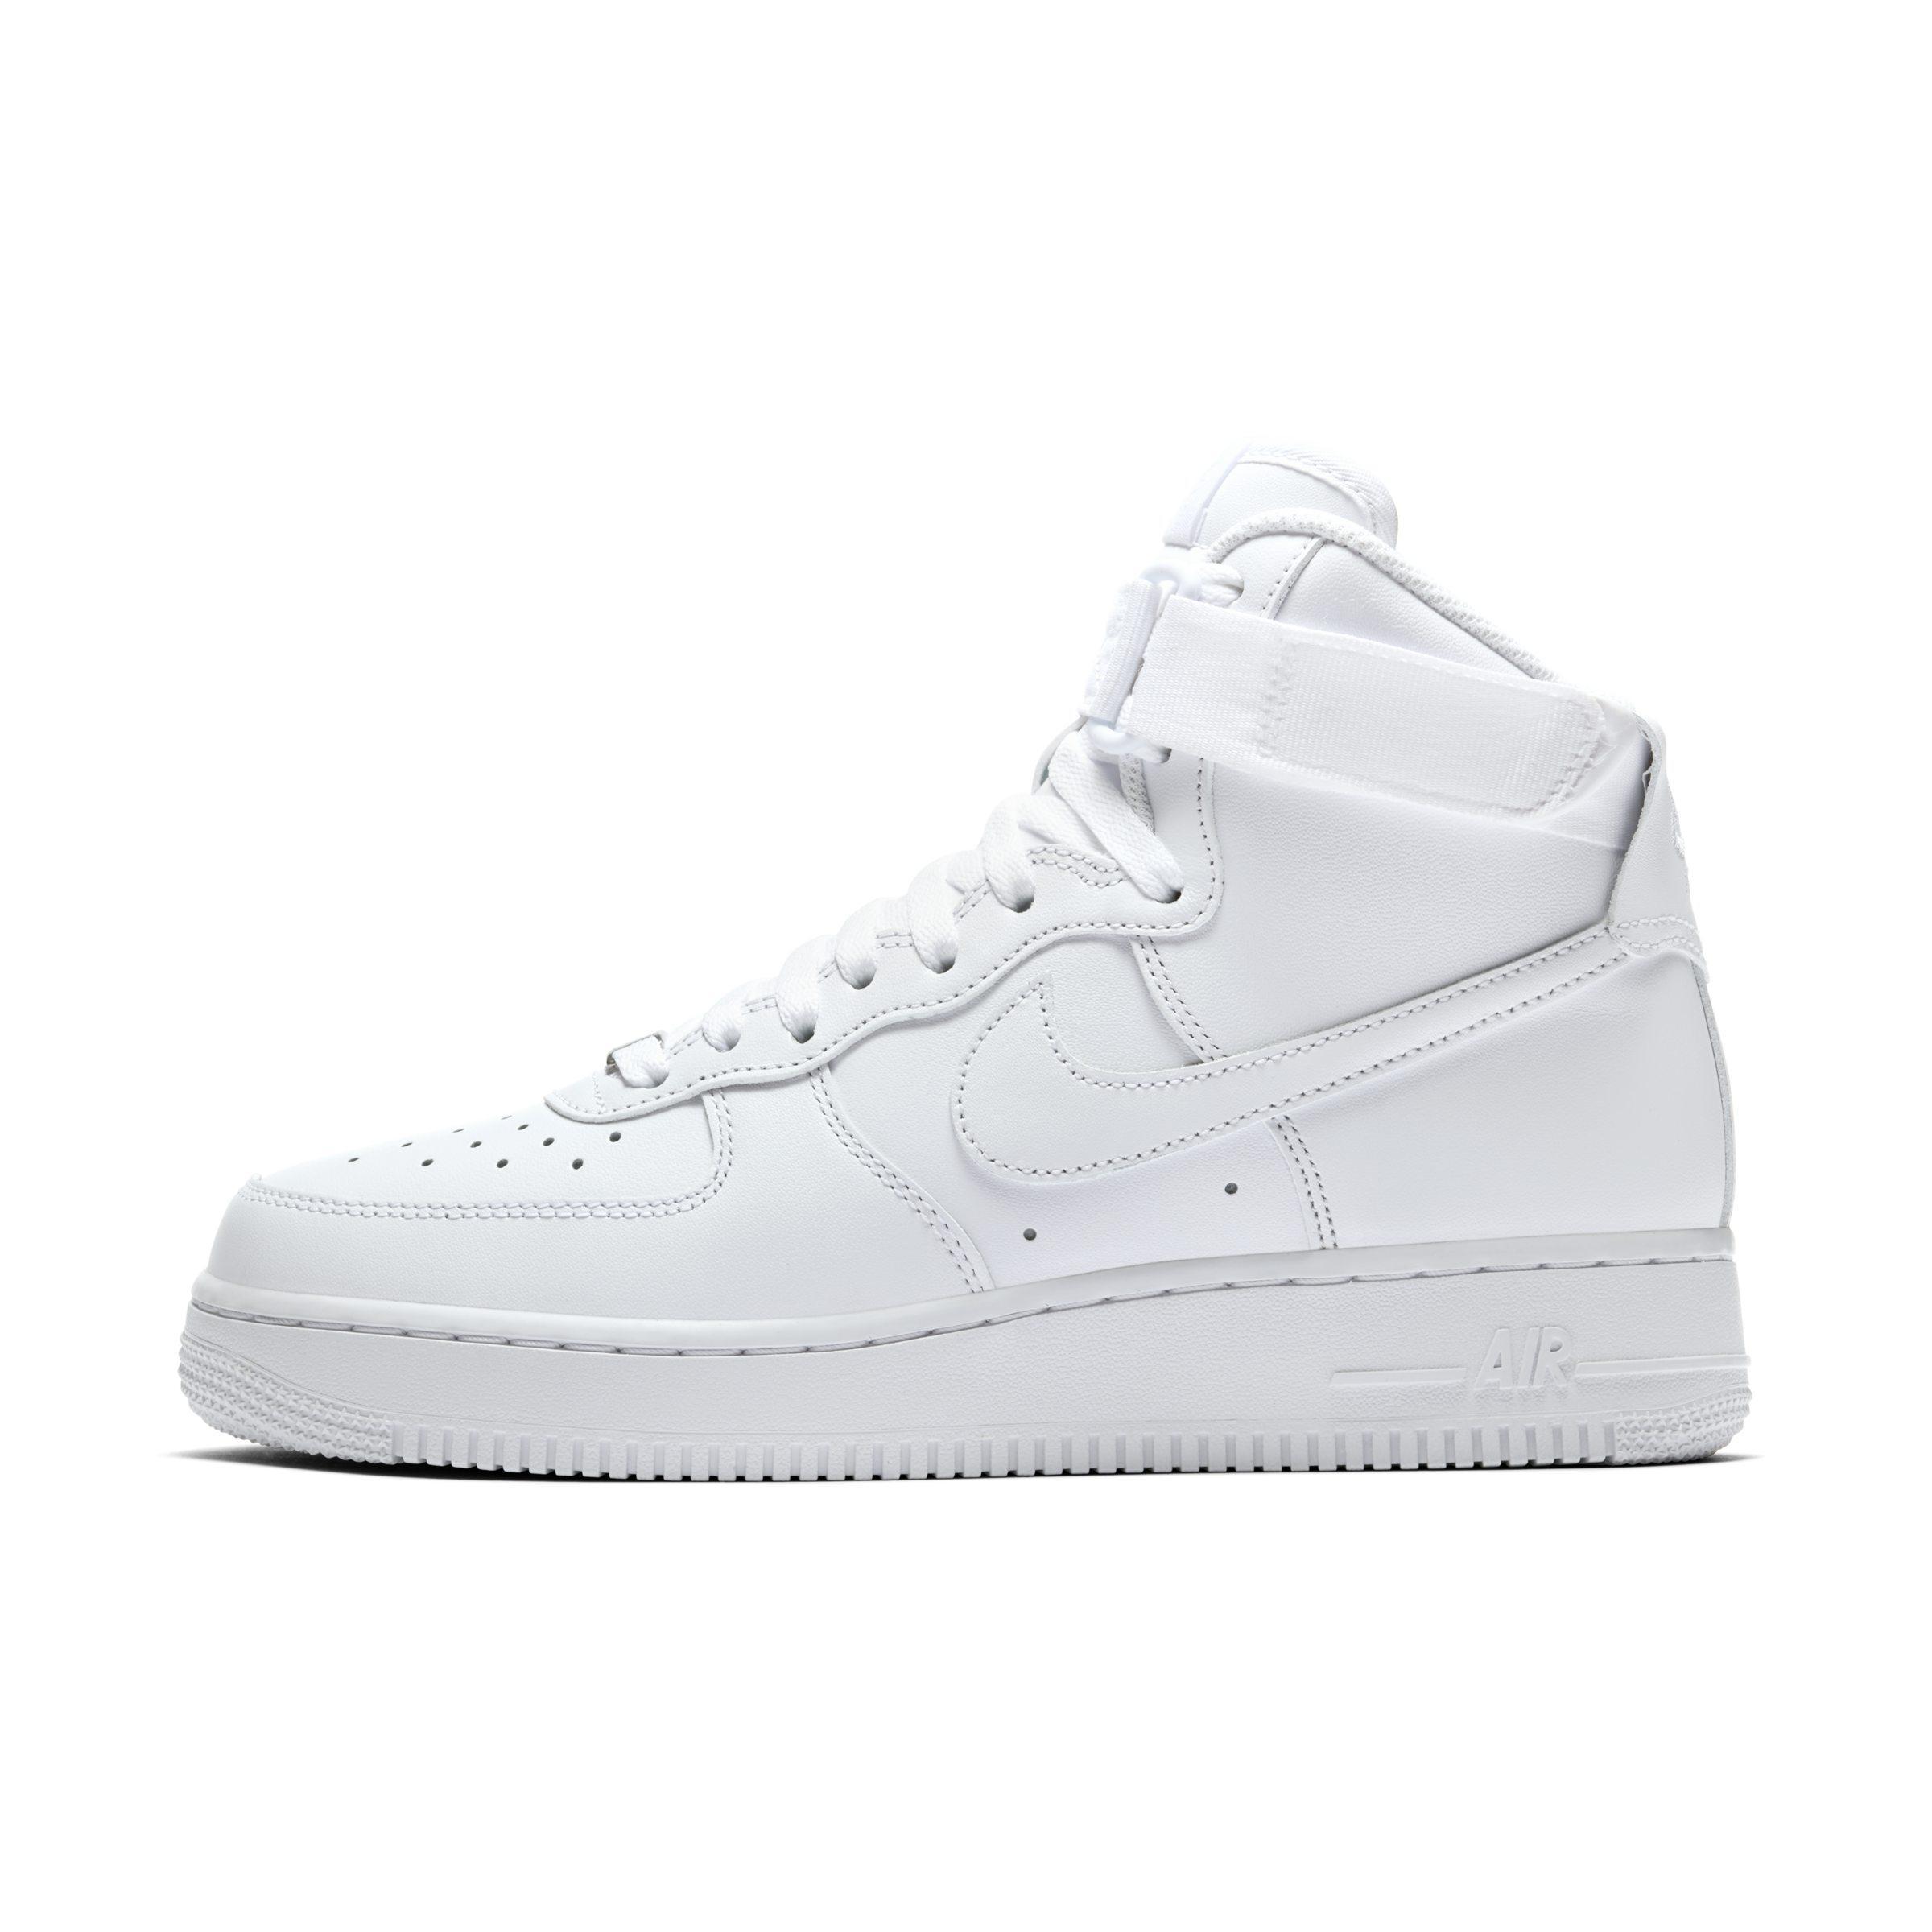 cheap for discount 742f6 e7805 Nike. Women s White Air Force 1 High 08 Le Shoe